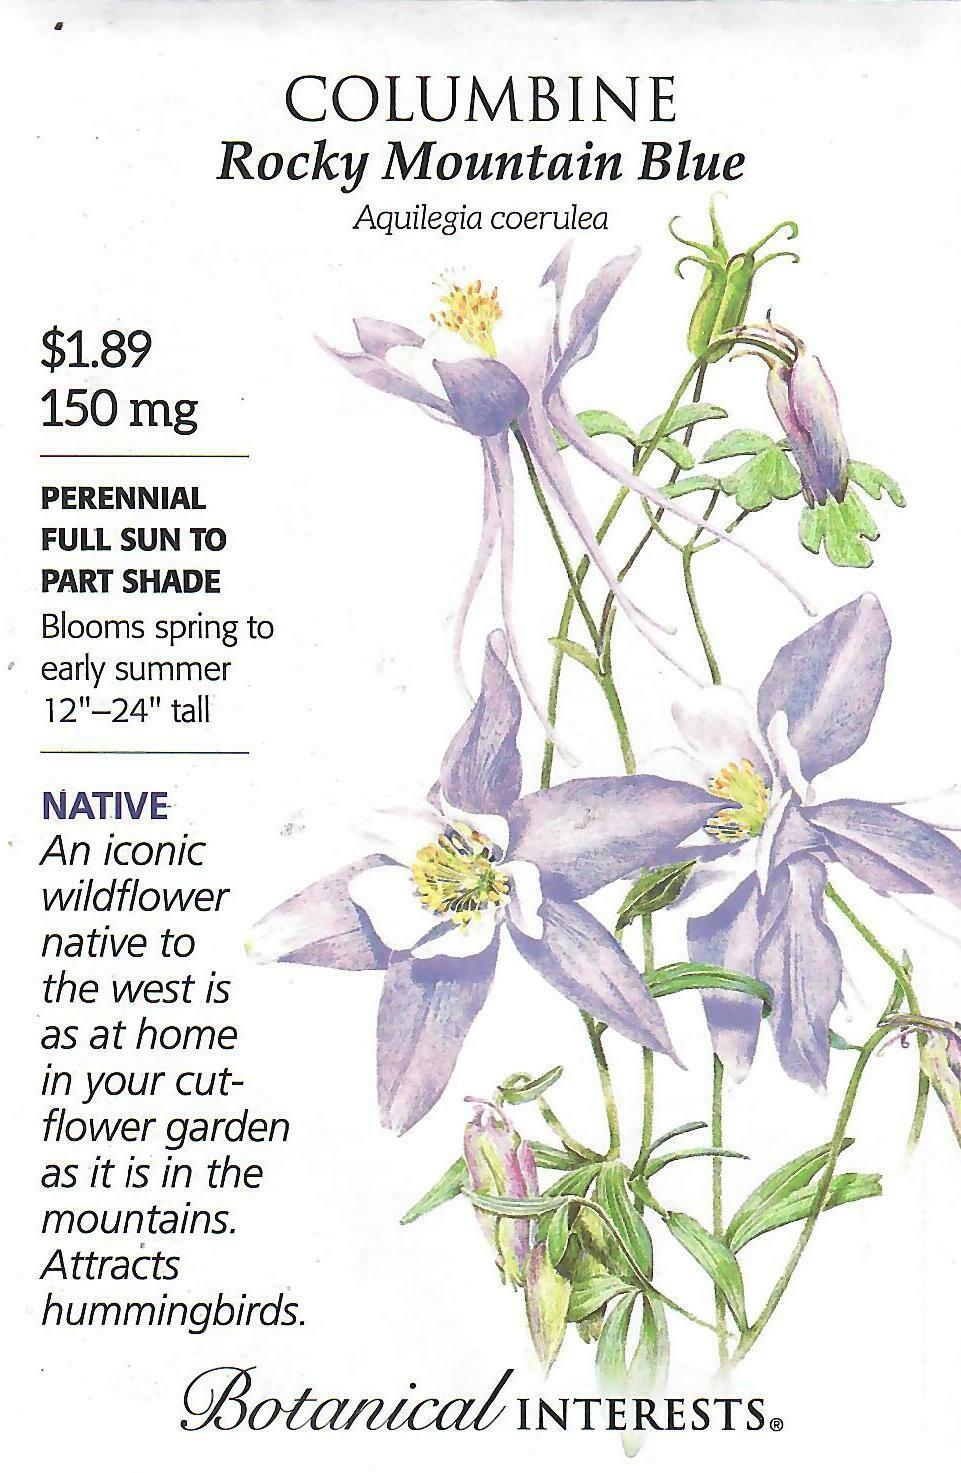 Columbine Rocky Mountain Blue Botanical Interests